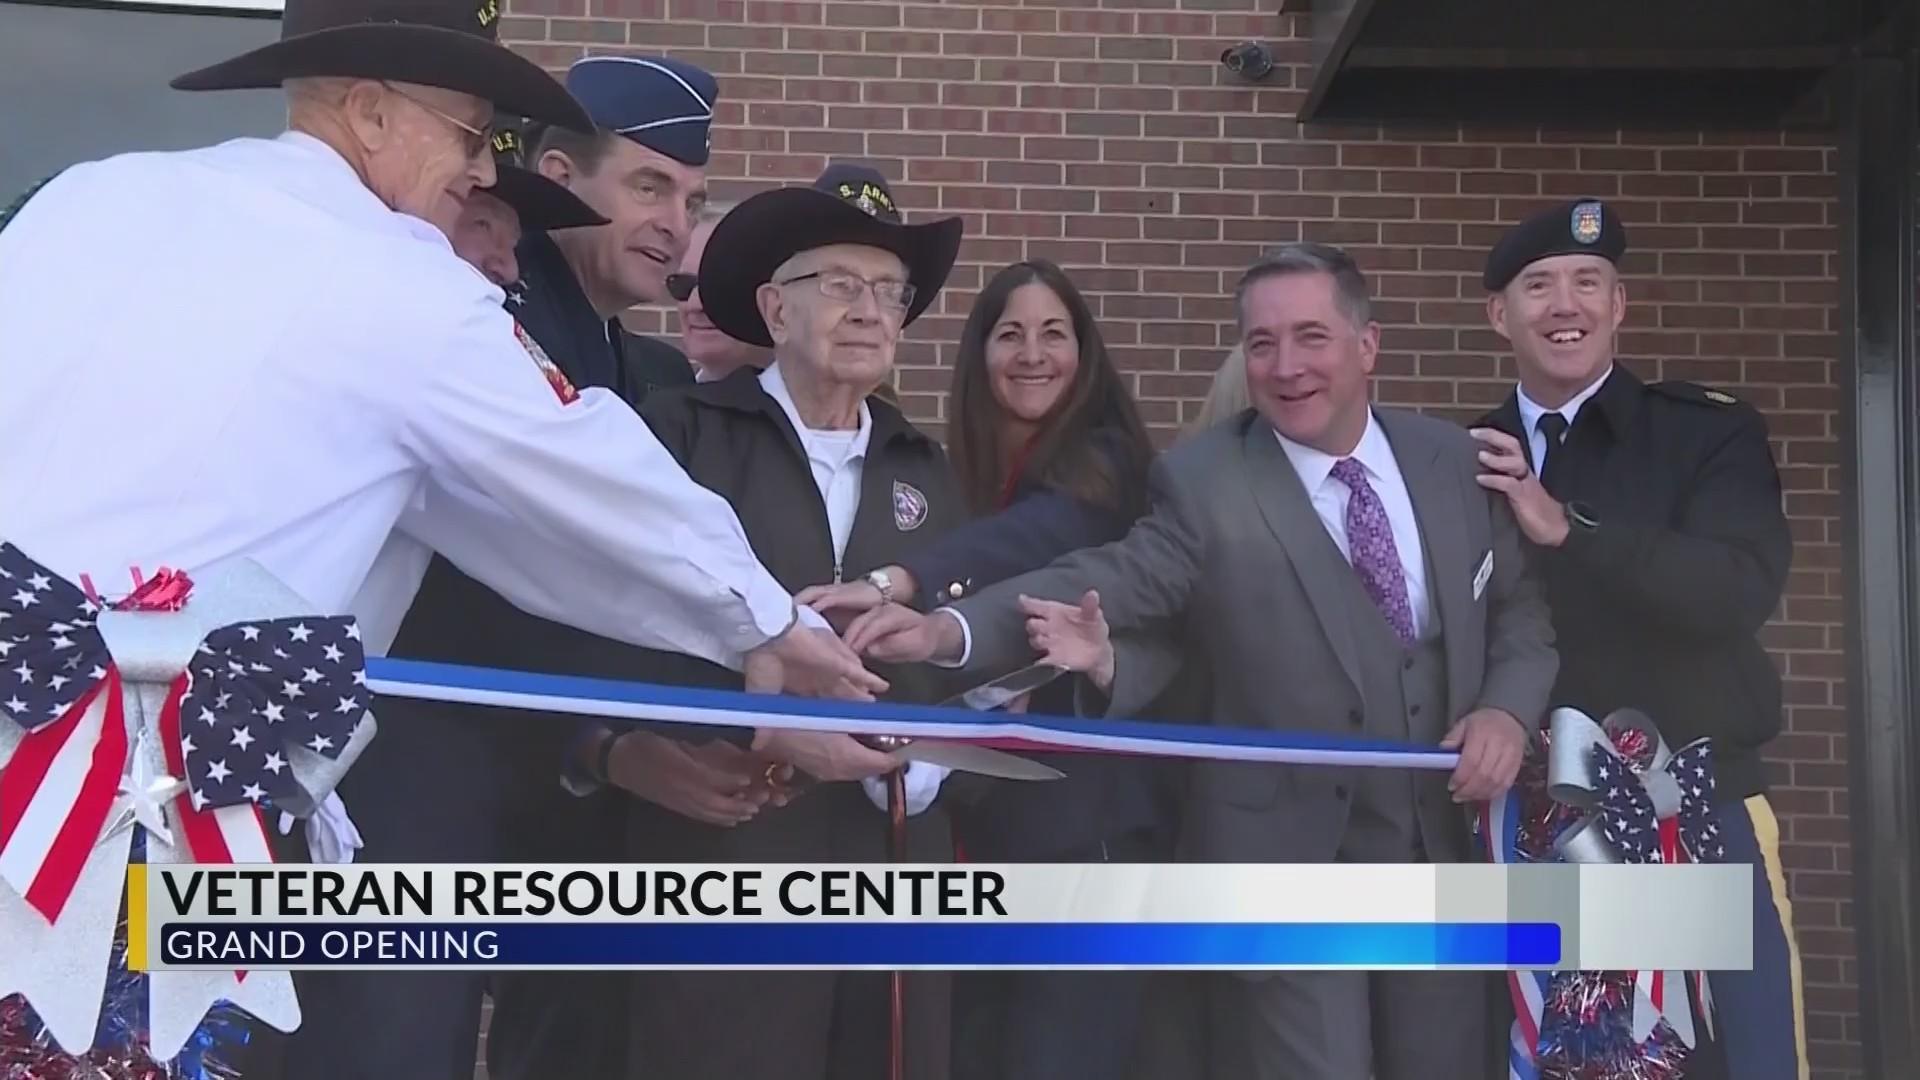 Veteran Resource Center